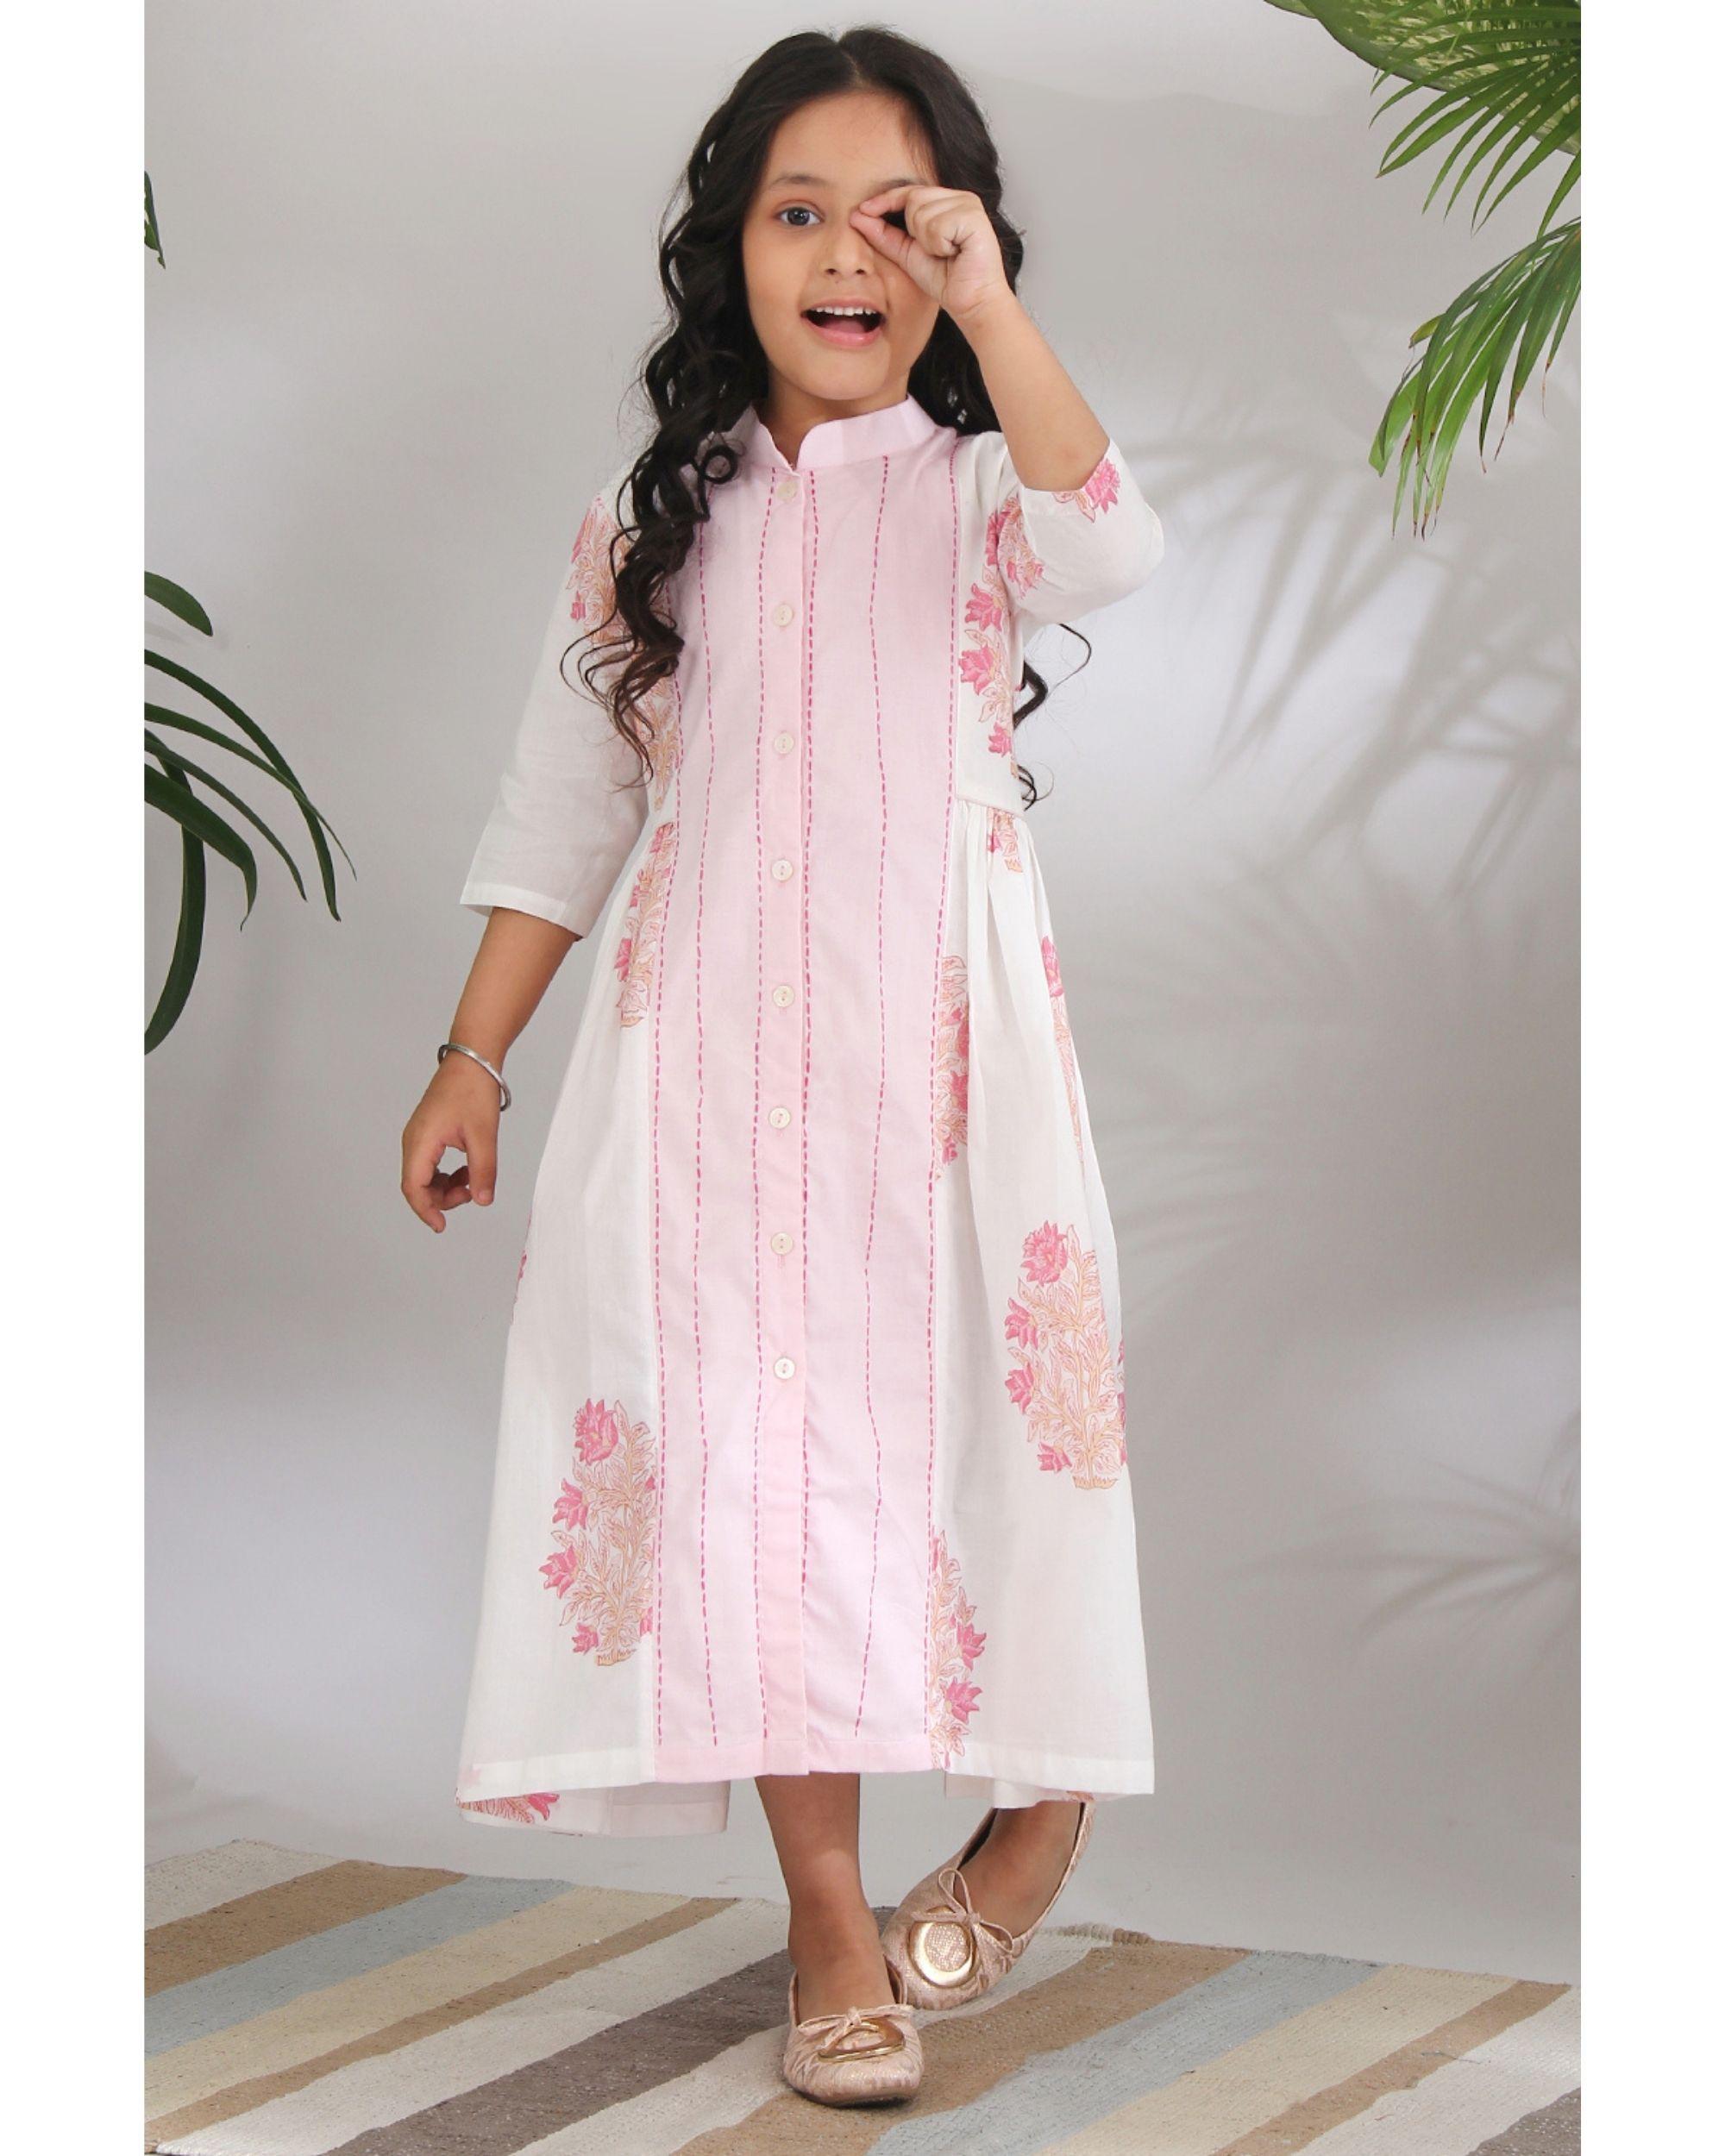 Panelled kantha dress